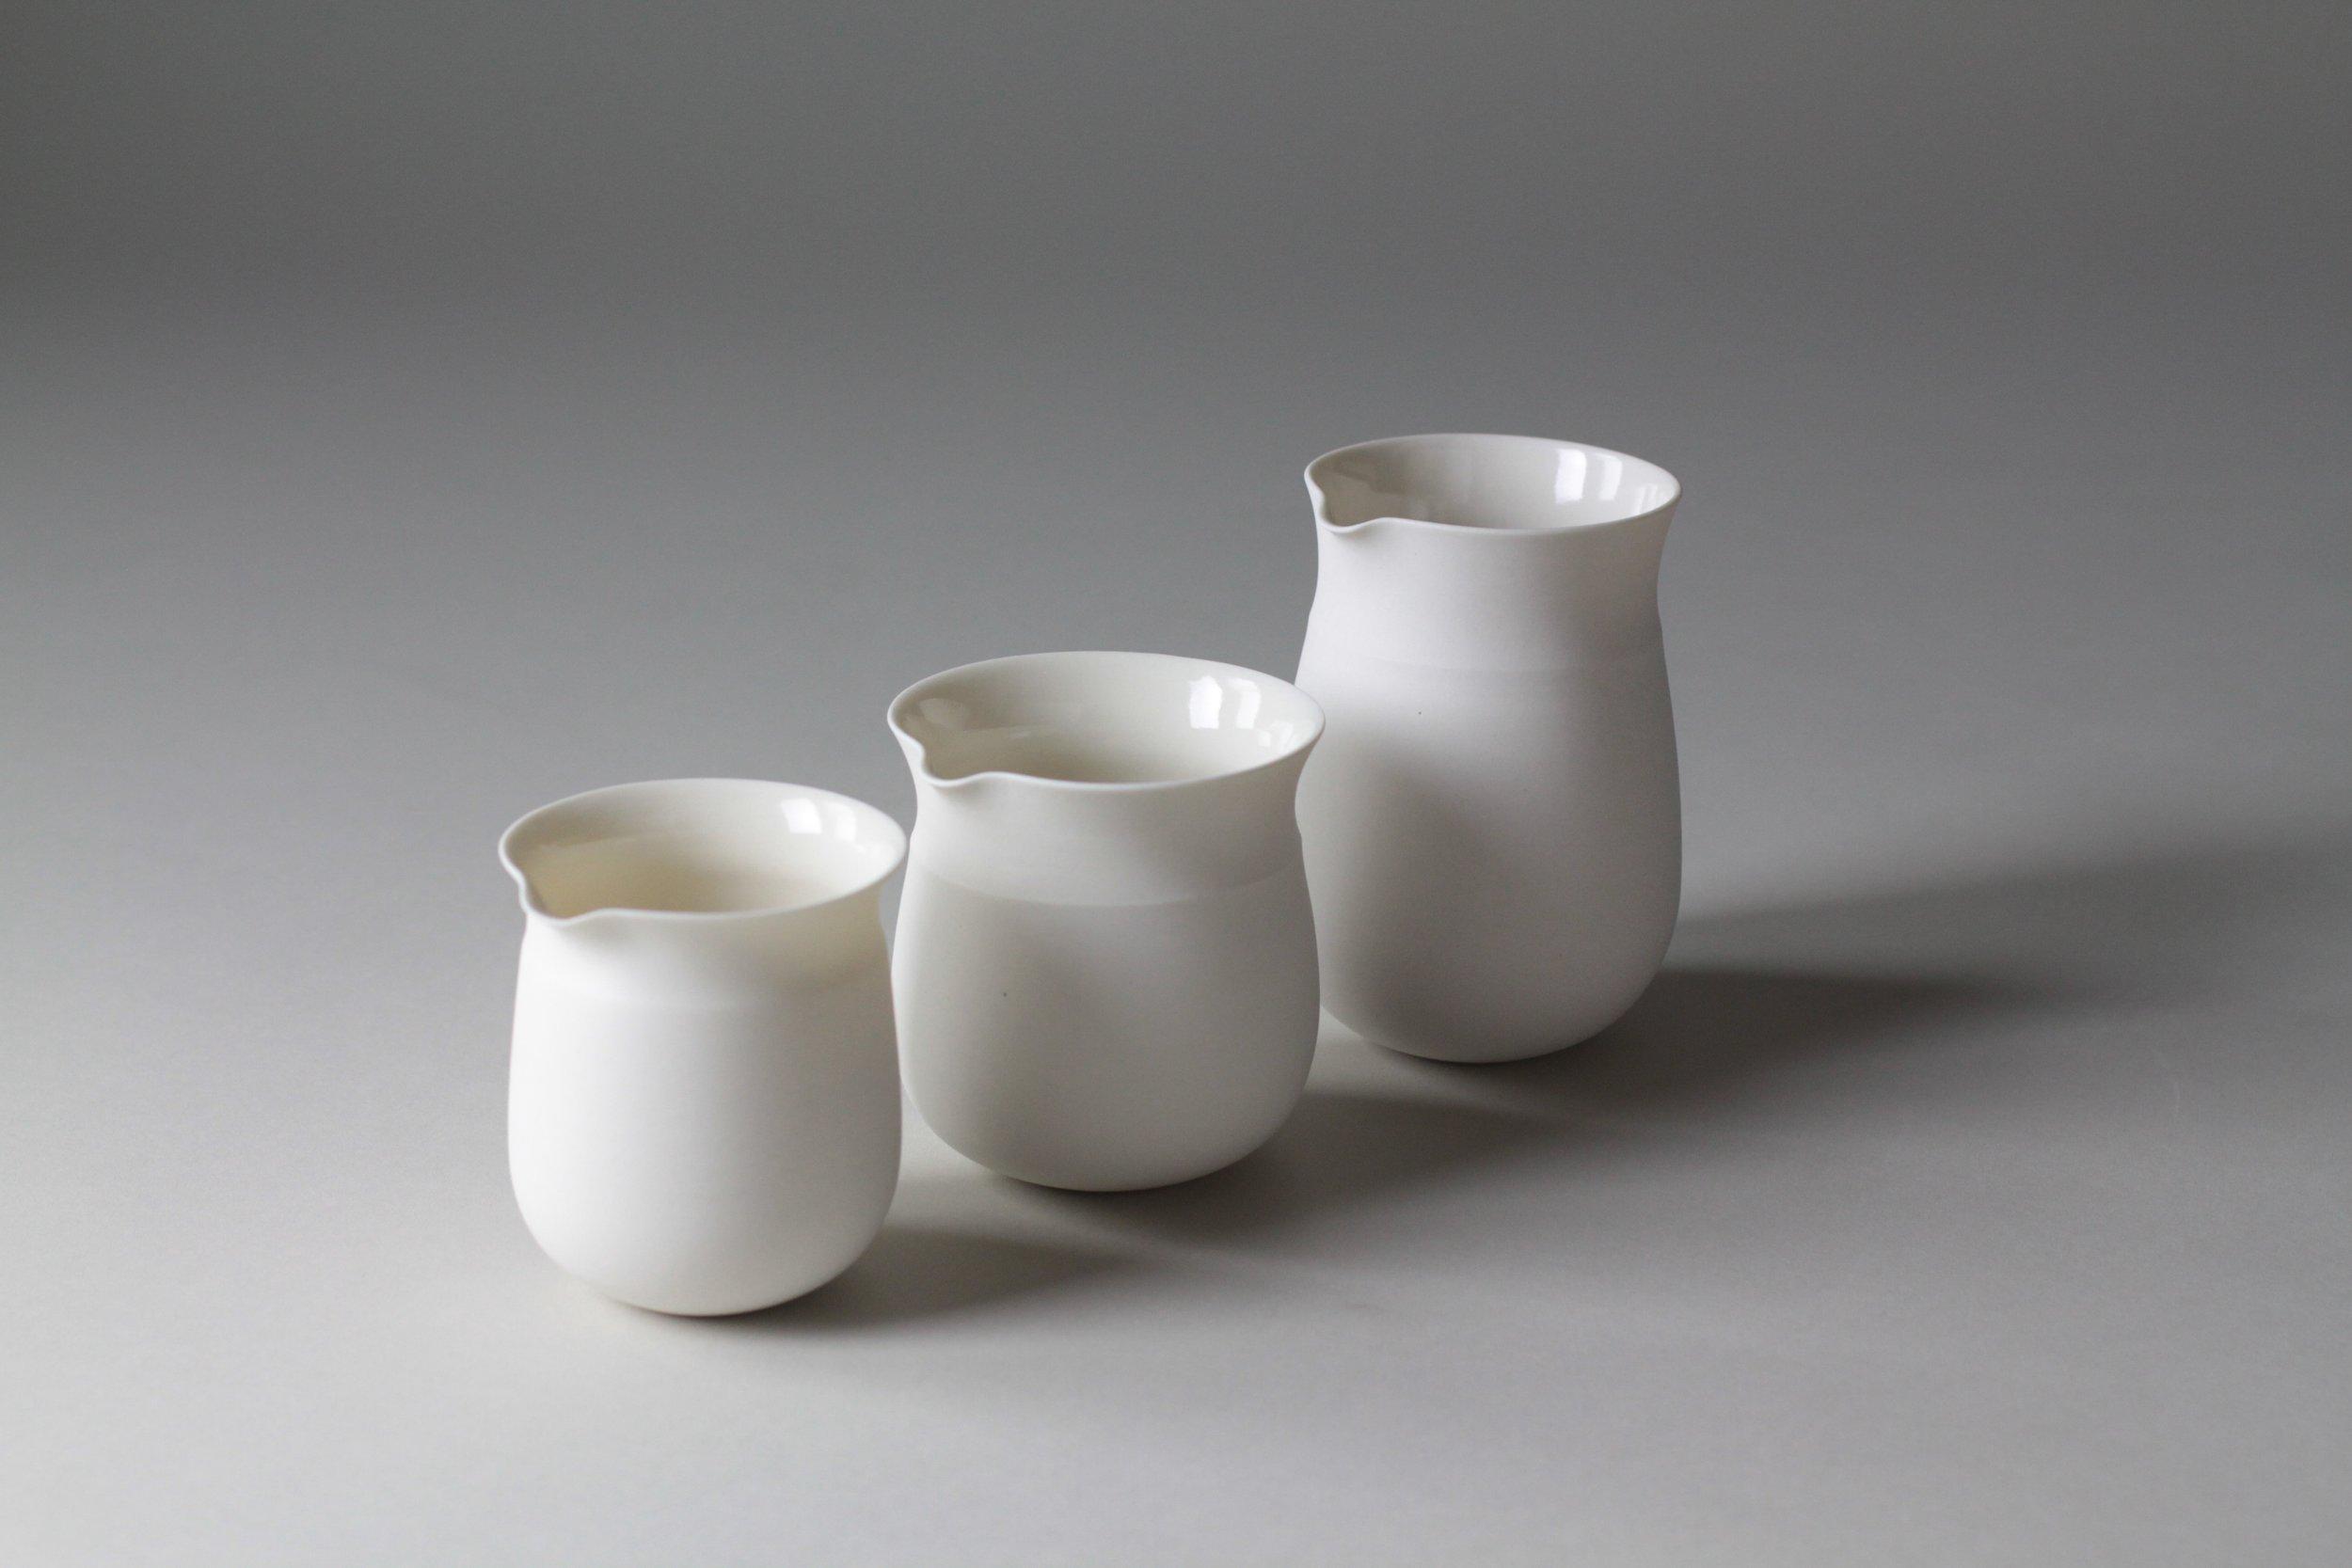 Ceramic tableware pourer by Lilith Rockett, Portland, Oregon